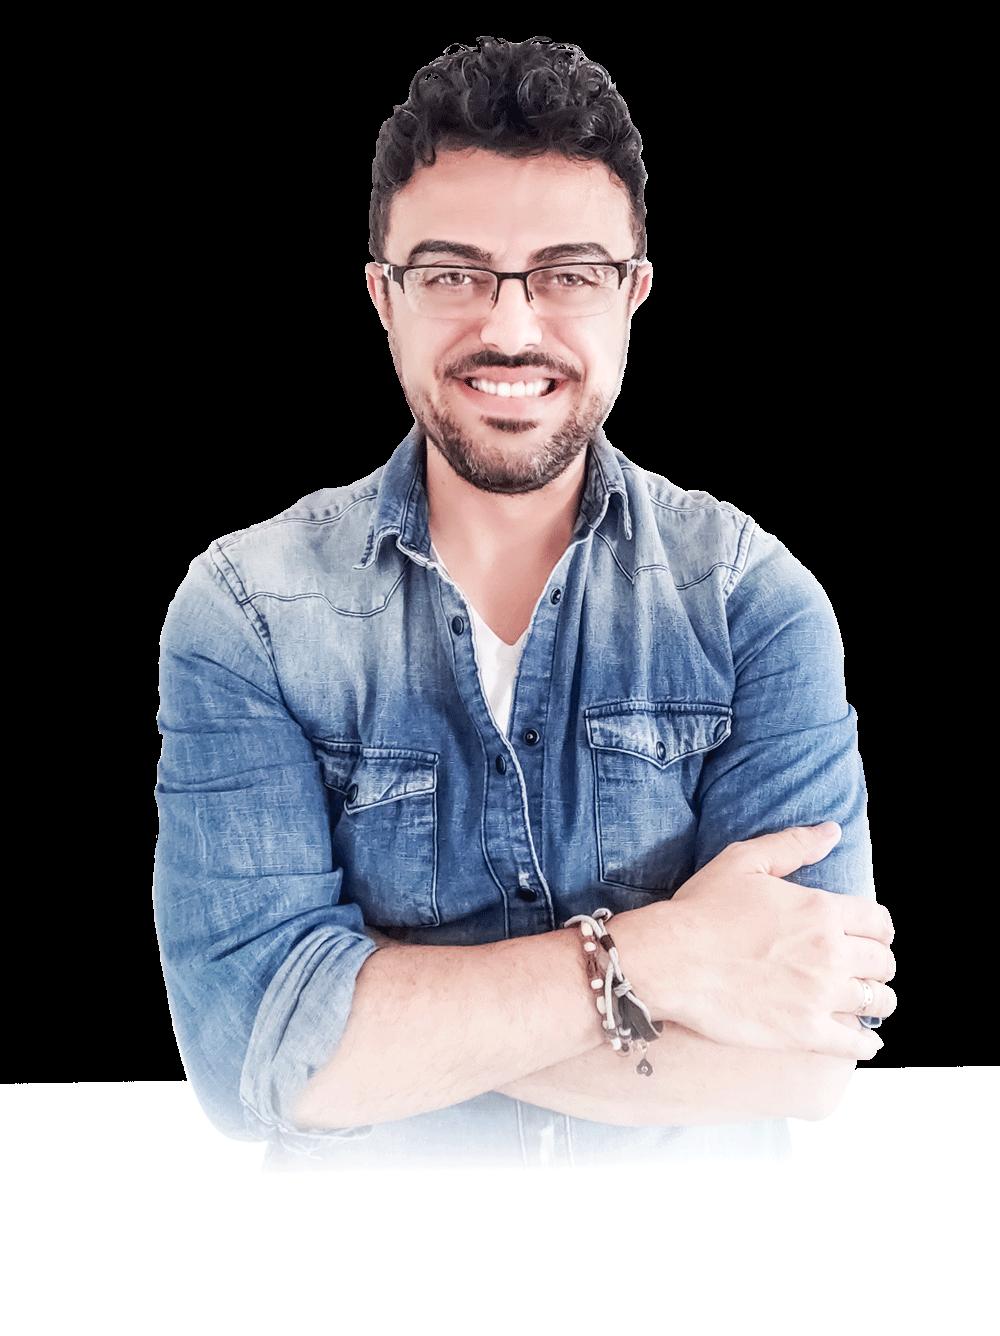 Consultor de Marketing Digital